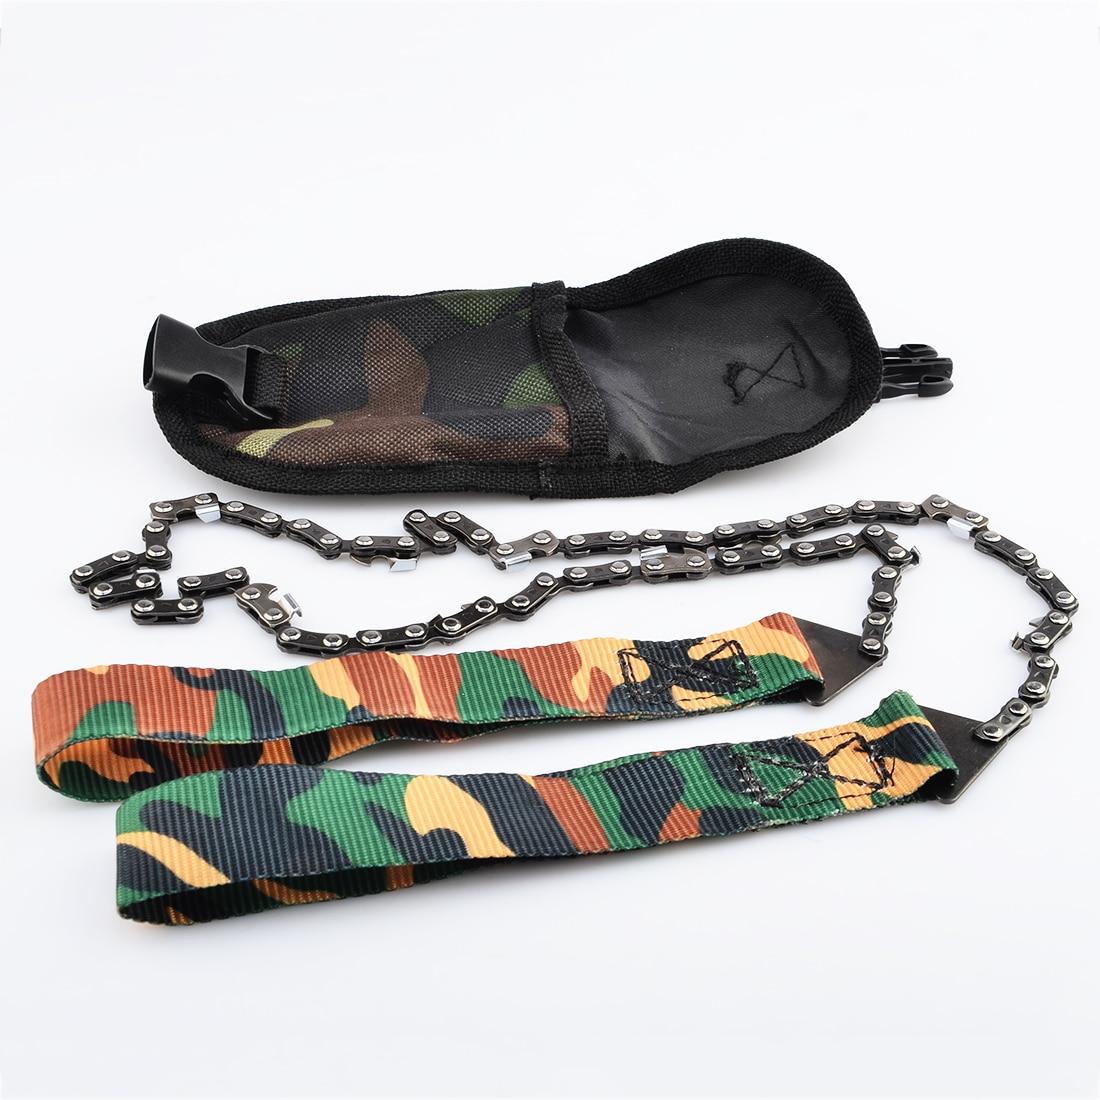 Portable Survival Gear : Outdoor survival gear manganese steel hand felling saw